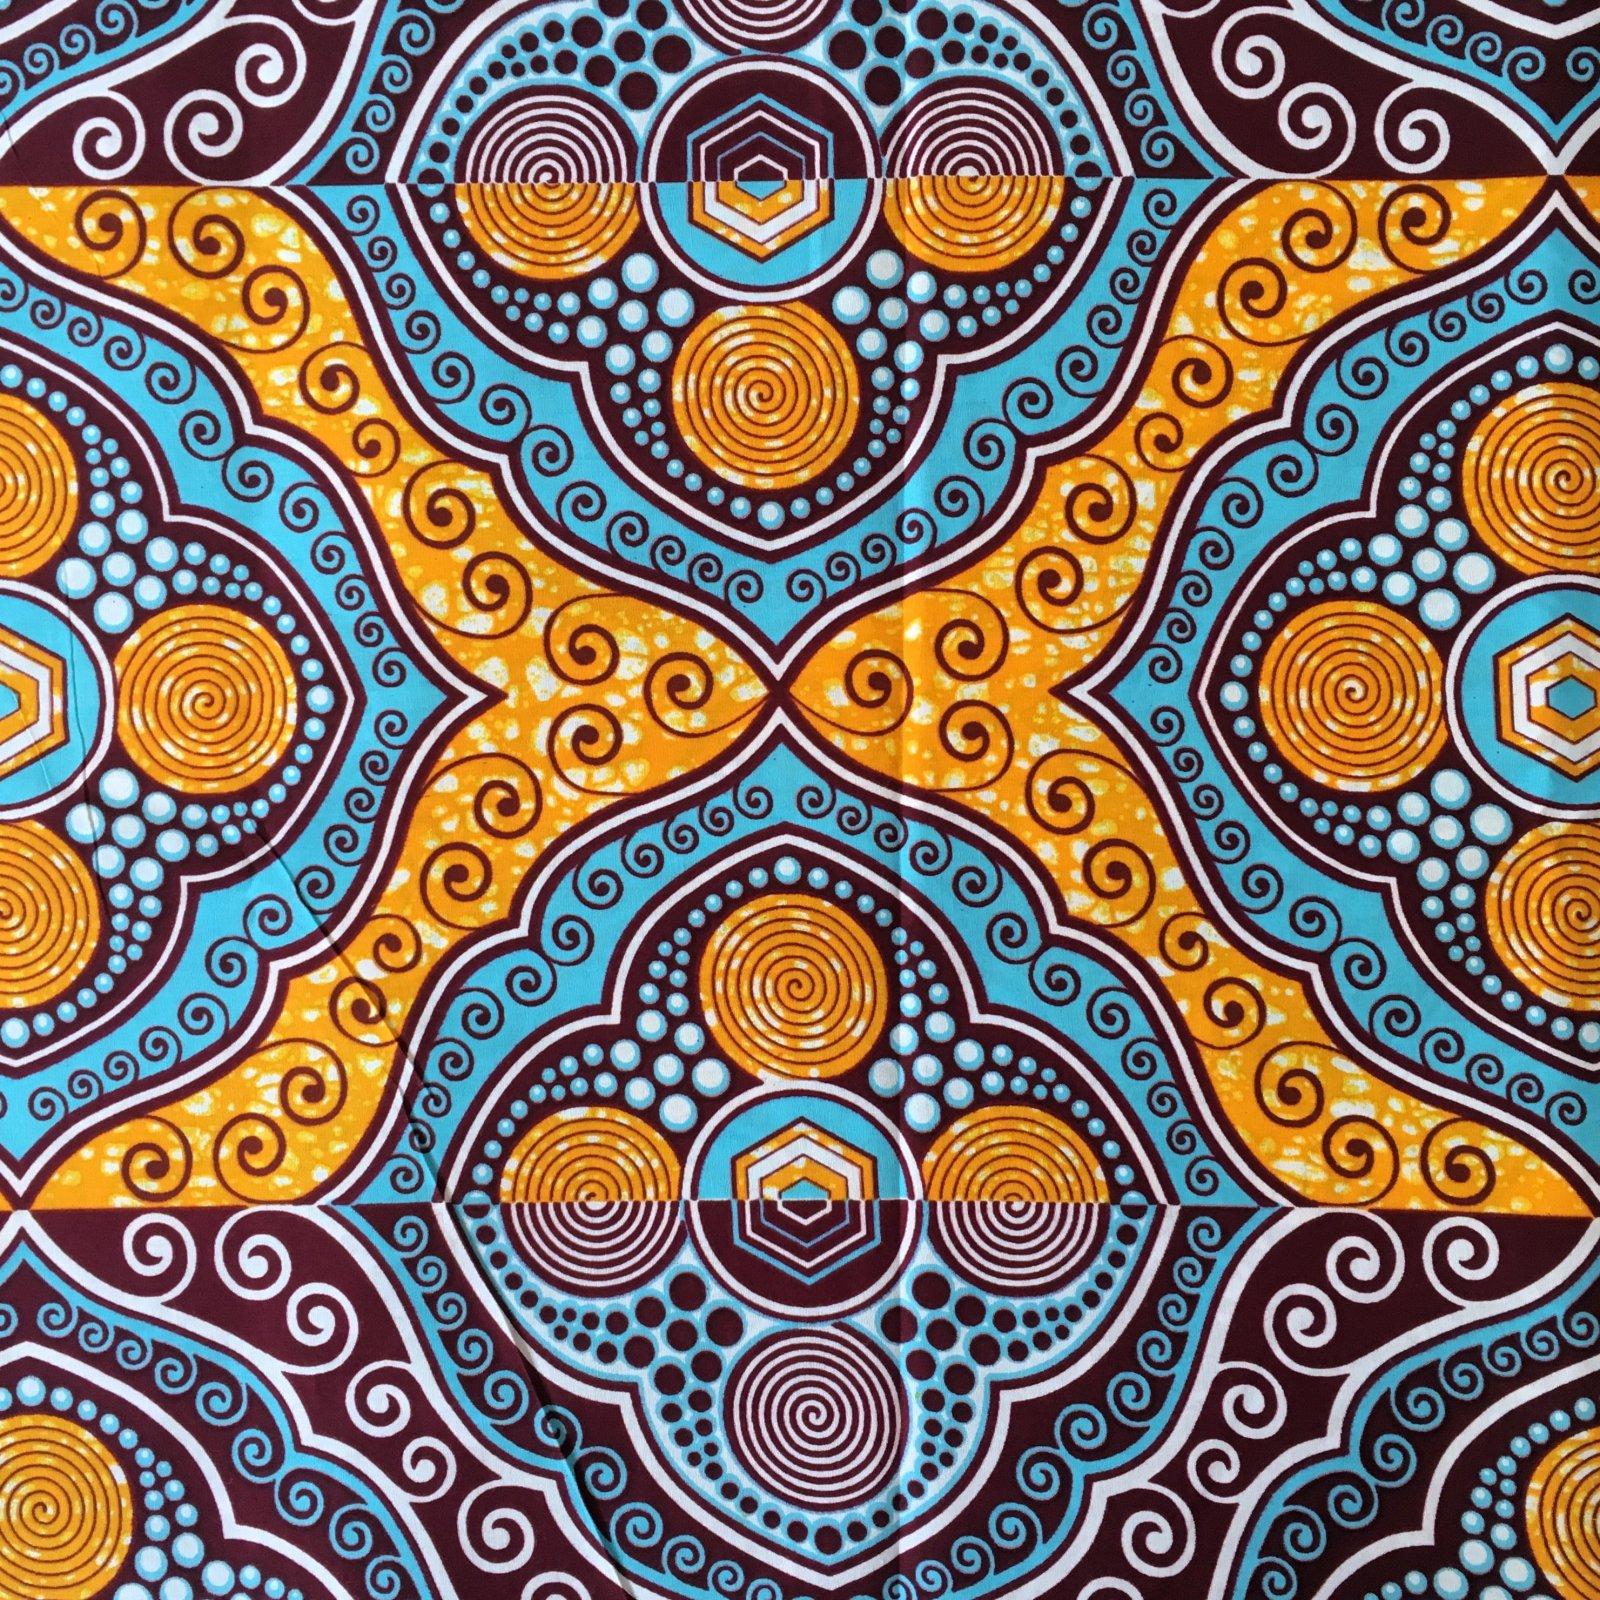 2.875 Yard Cut African Wax Block Fabric (Bakoy)